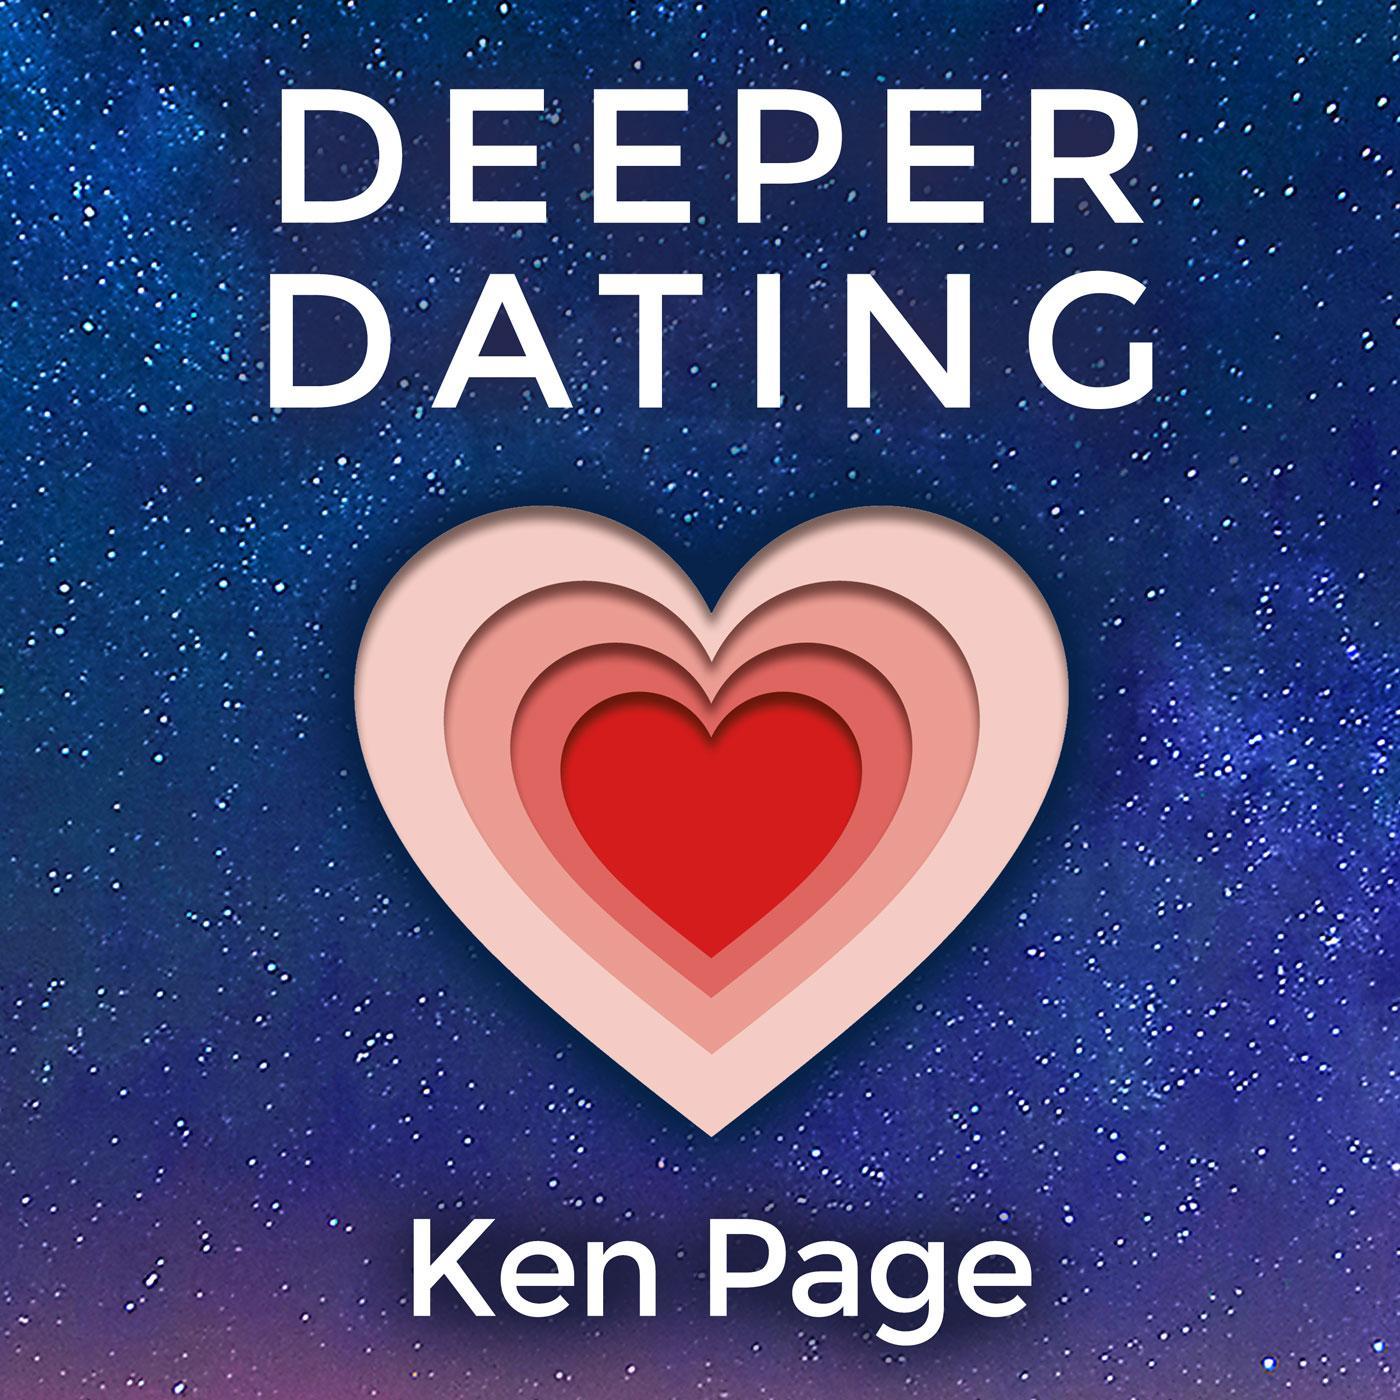 online dating hjrta avtalad tid mte f veta - Pixabay